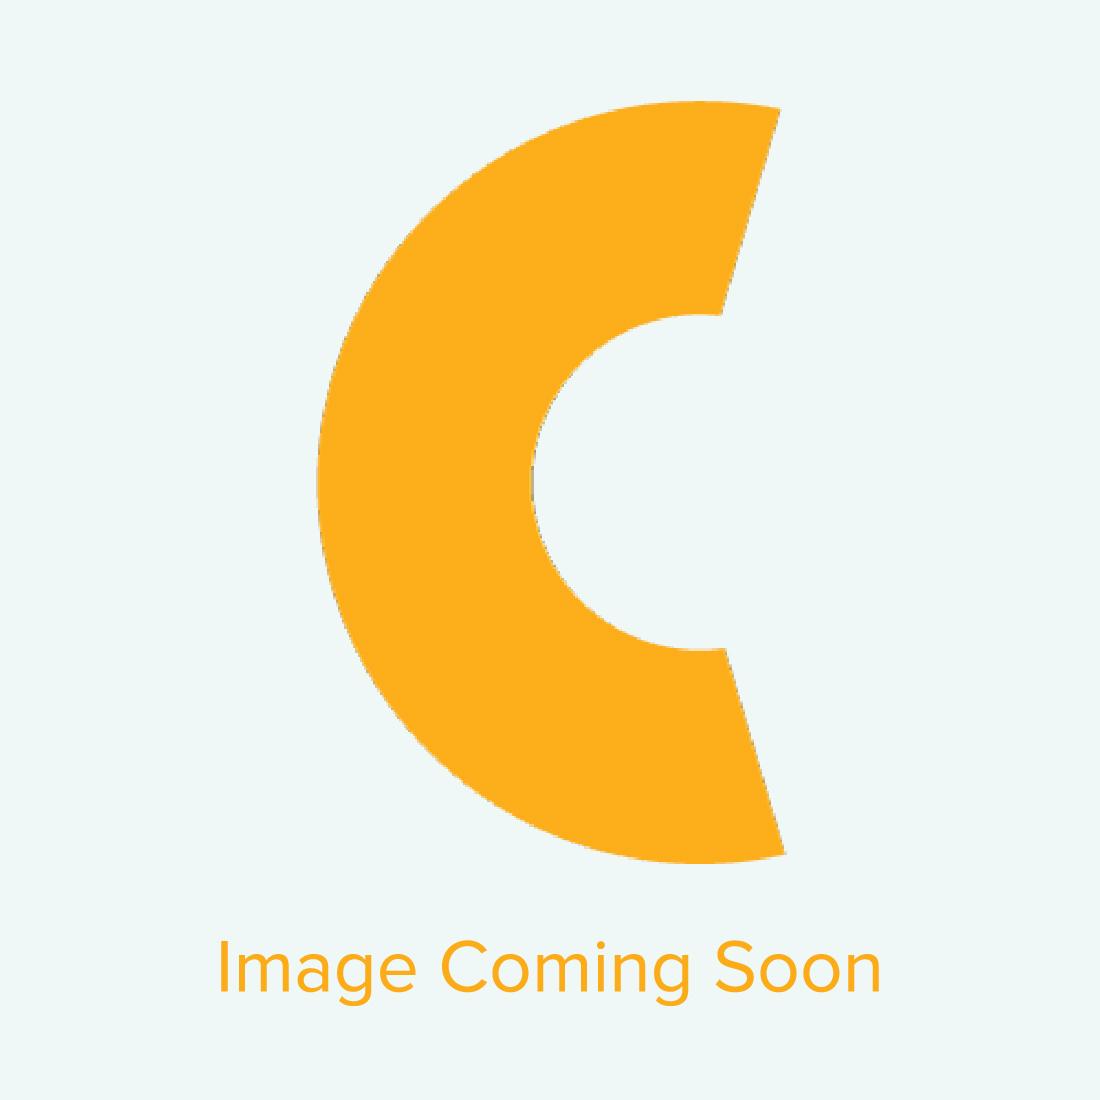 "Unisub 7/8"" Diameter Circle Earring 20/case"